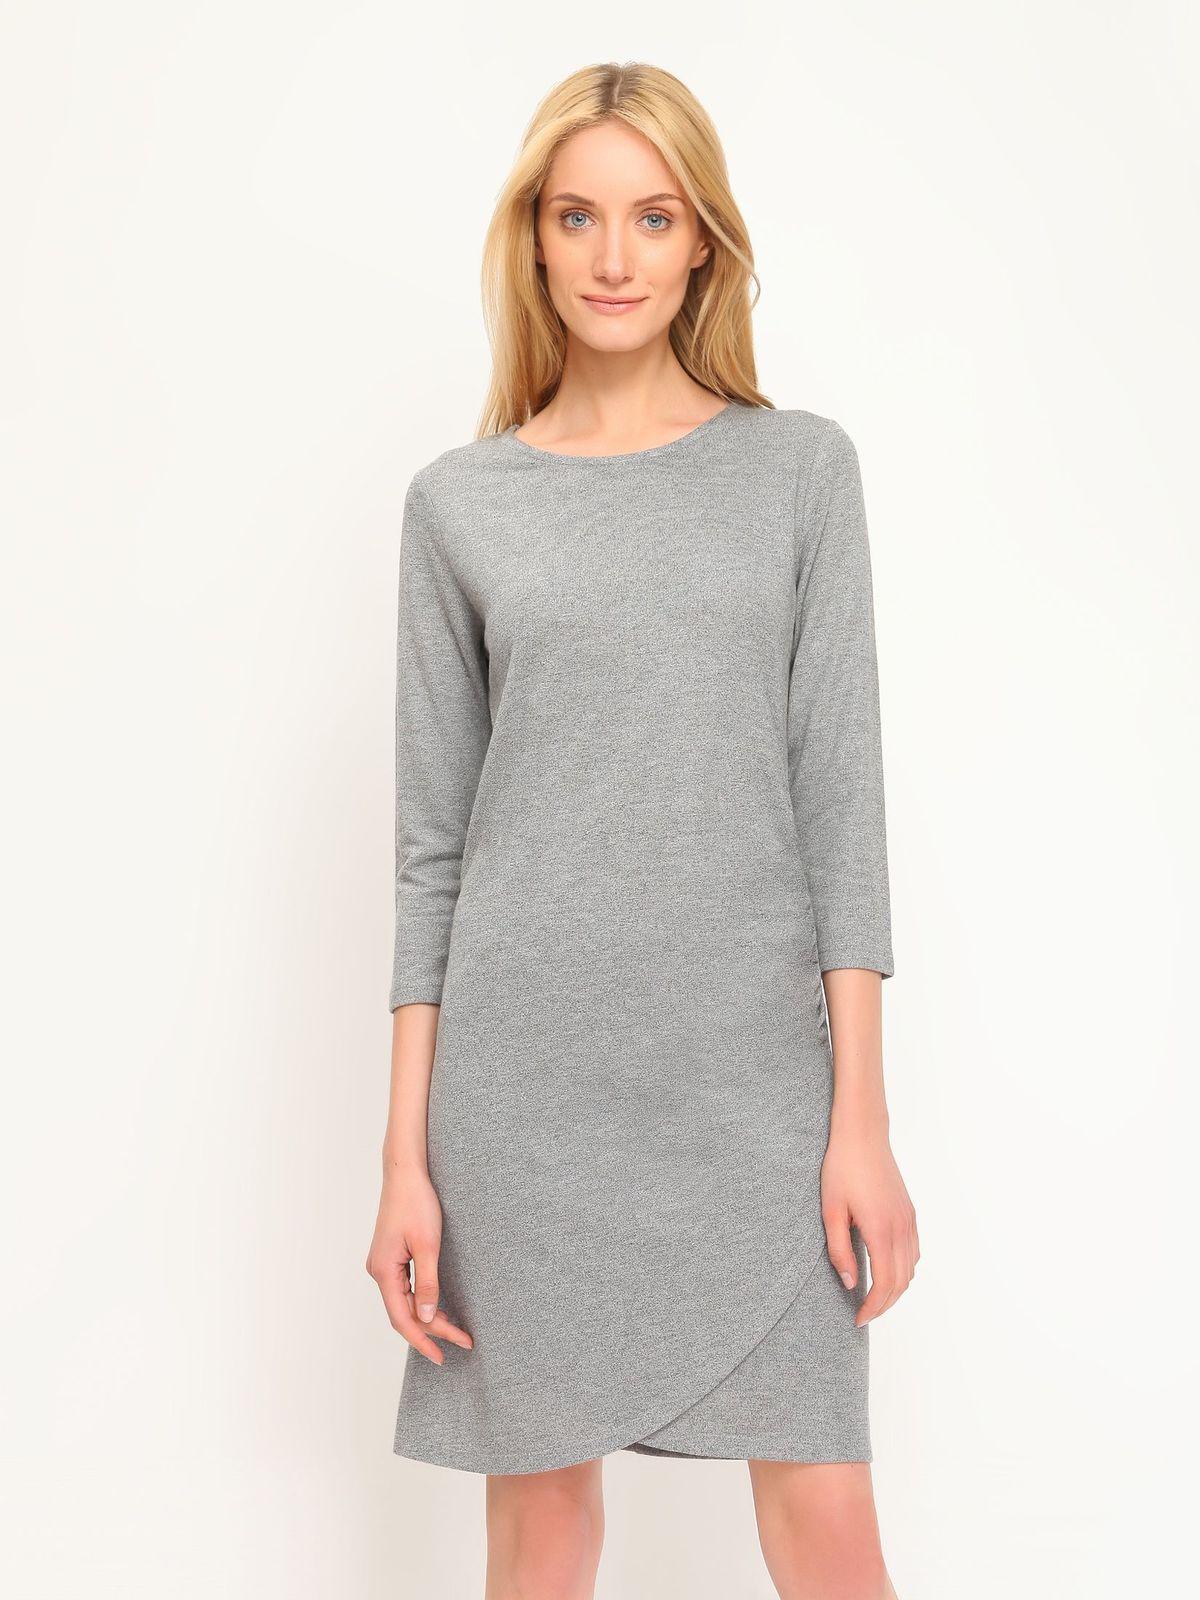 Top Secret dámské šaty